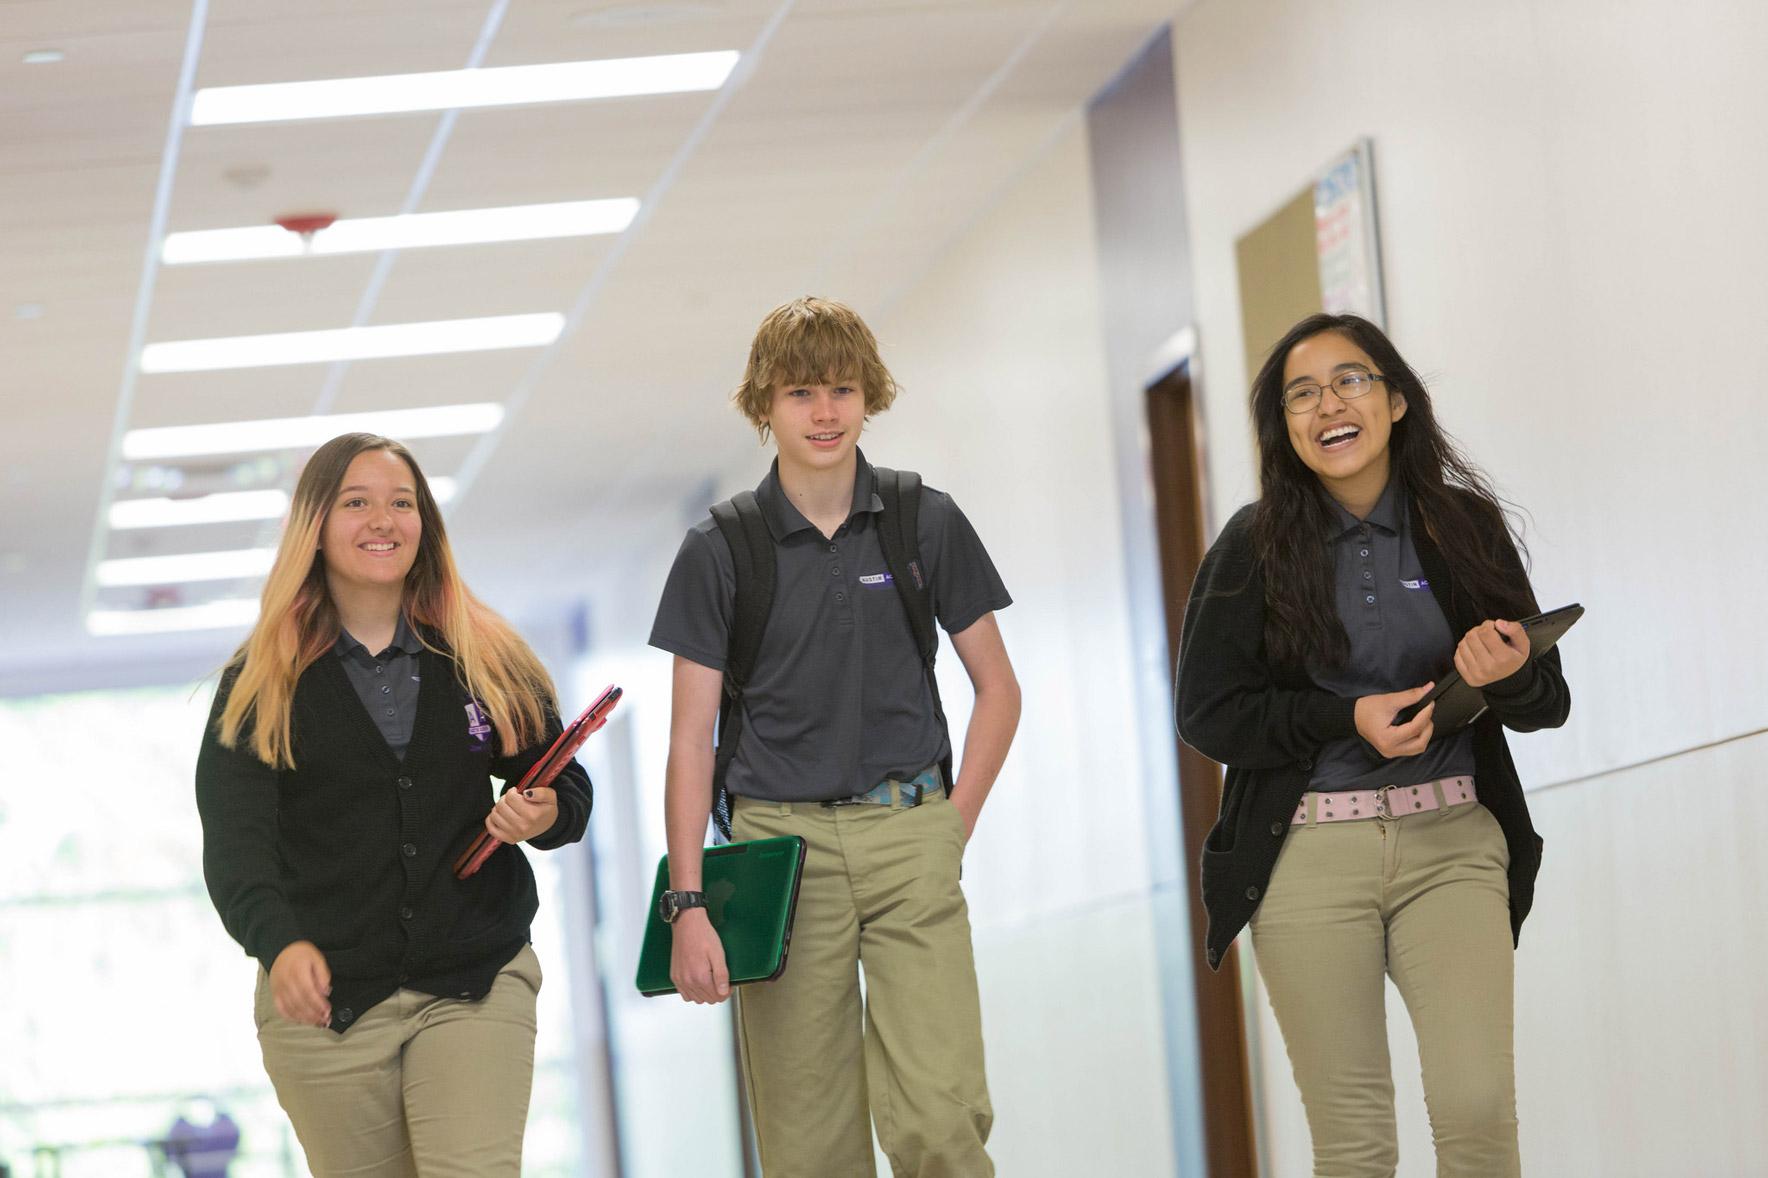 Students Serena Murphy, Ian Wood, Odalys Contreras